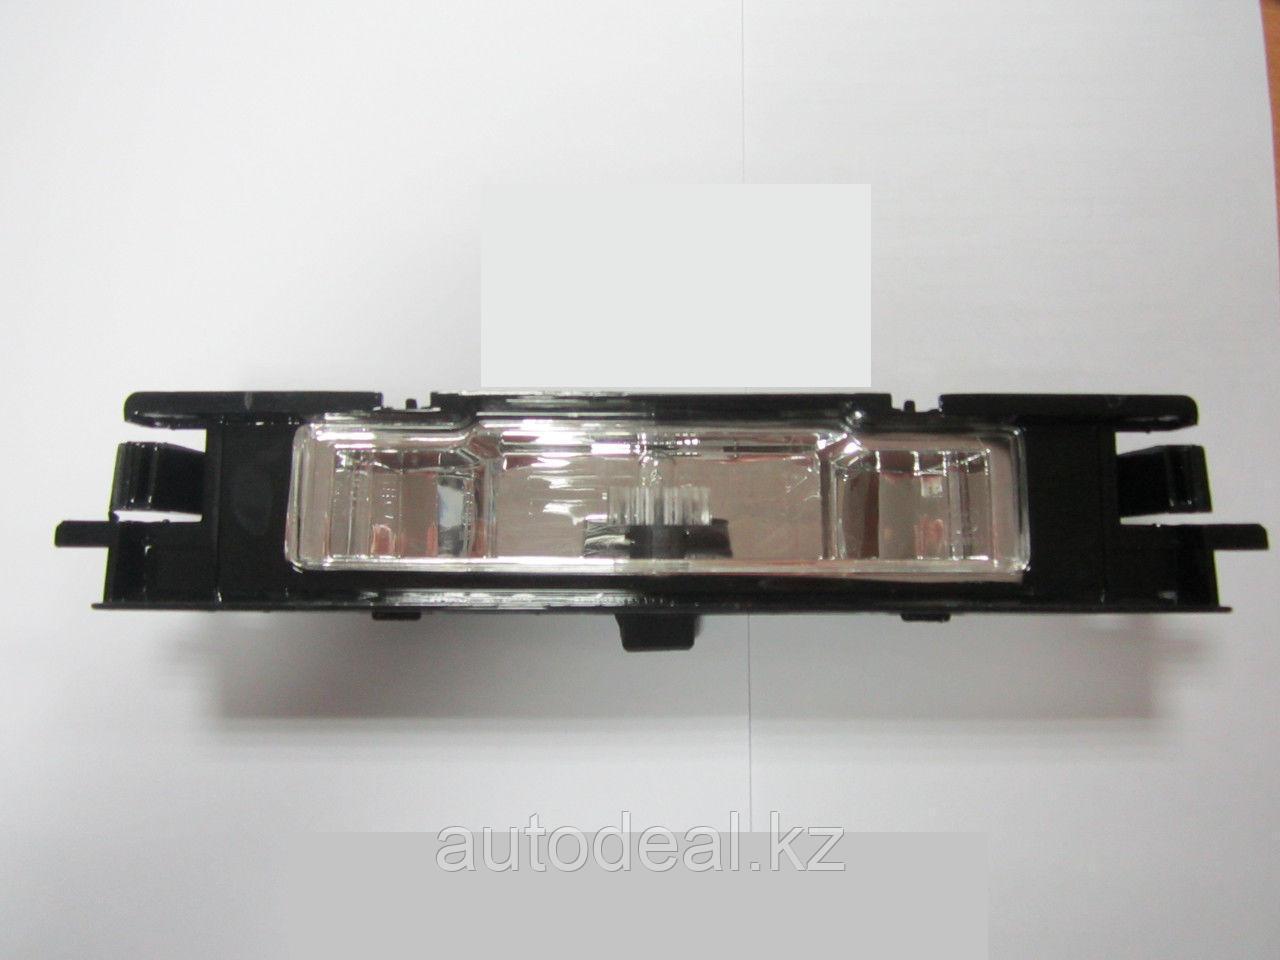 Подсветка номерного знака Geely MK CROSS / Registration number plate light